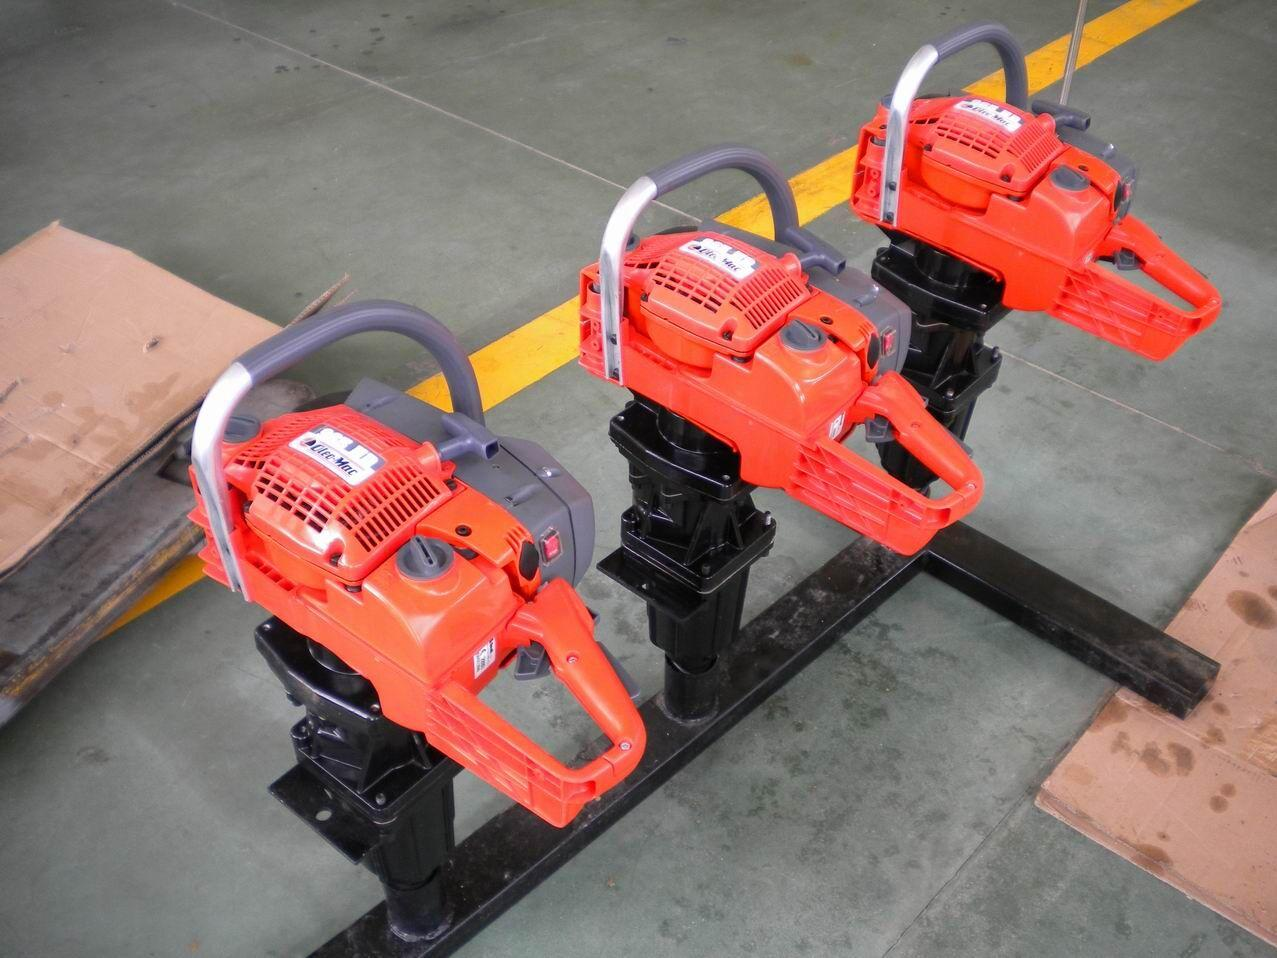 Railway maintenance Torque adjustable internal combustion bolt wrench NLB-1200 12